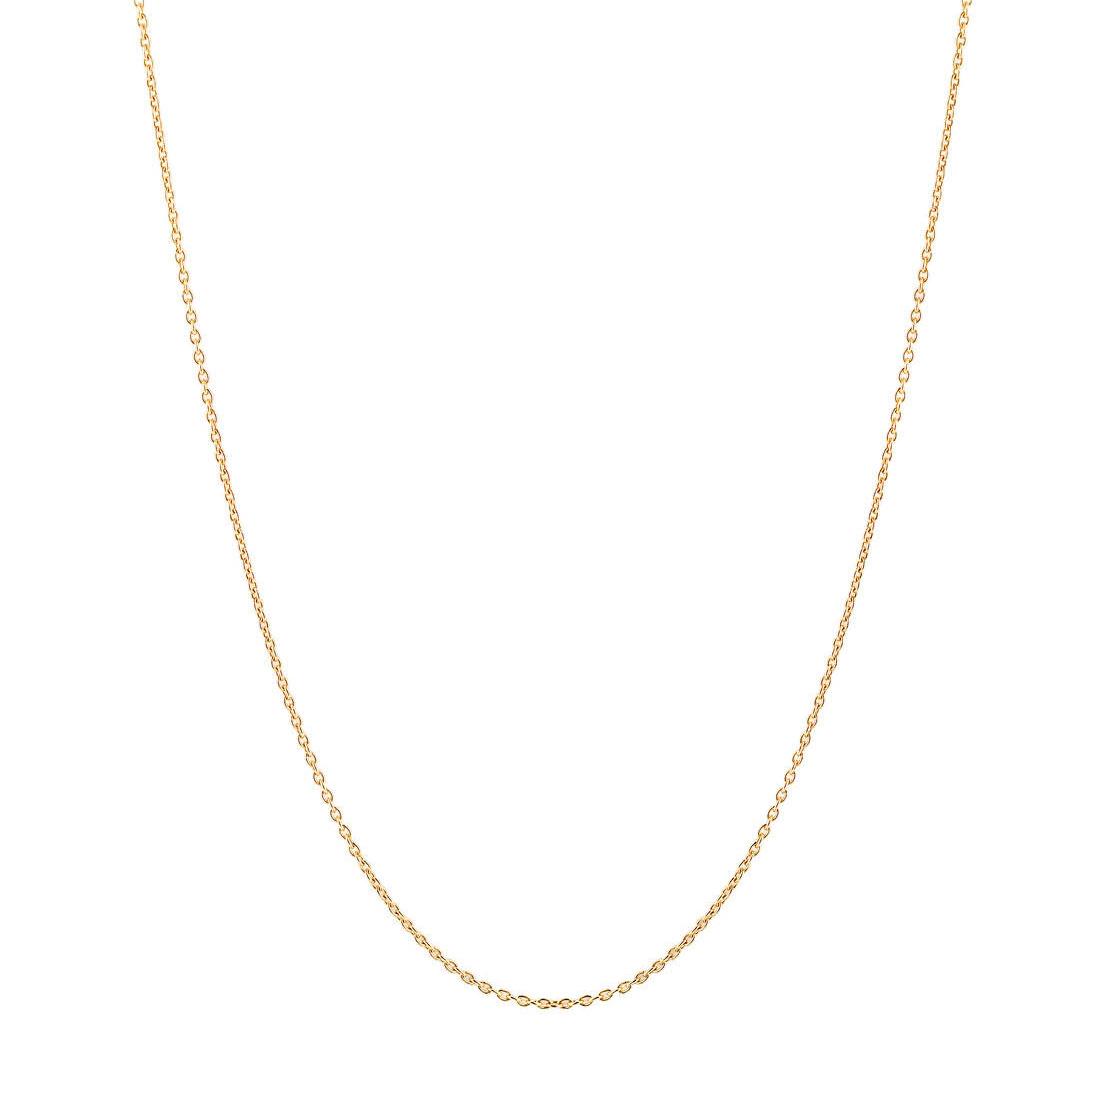 TI SENTO-Milano 3933SY Ketting zilver goudkleurig 60 cm